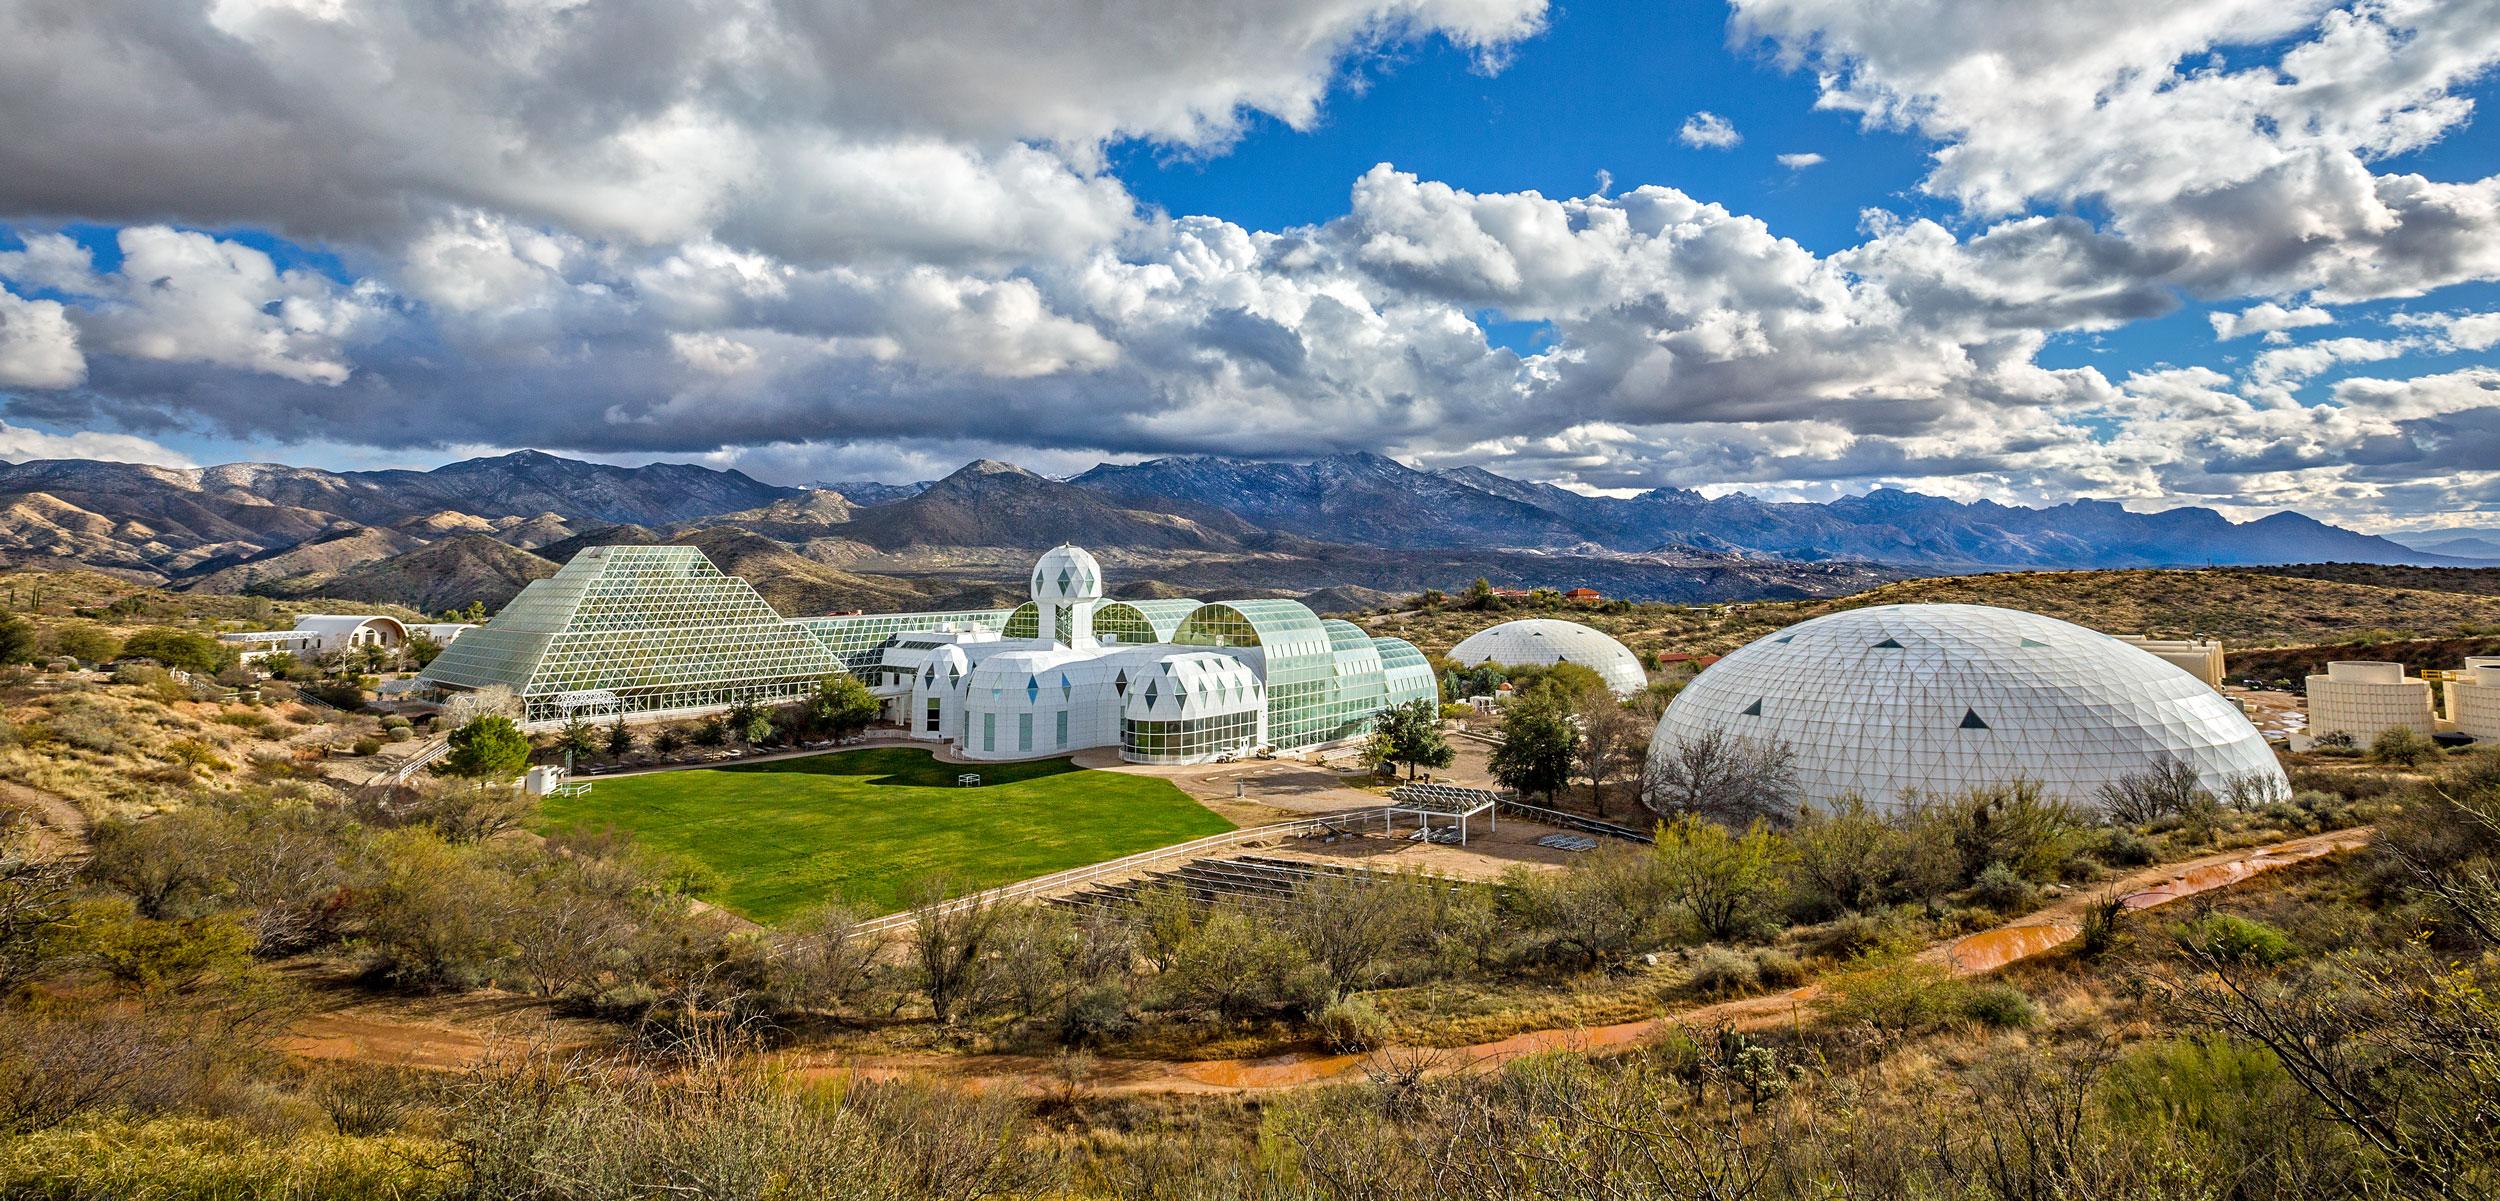 exterior of Biosphere 2